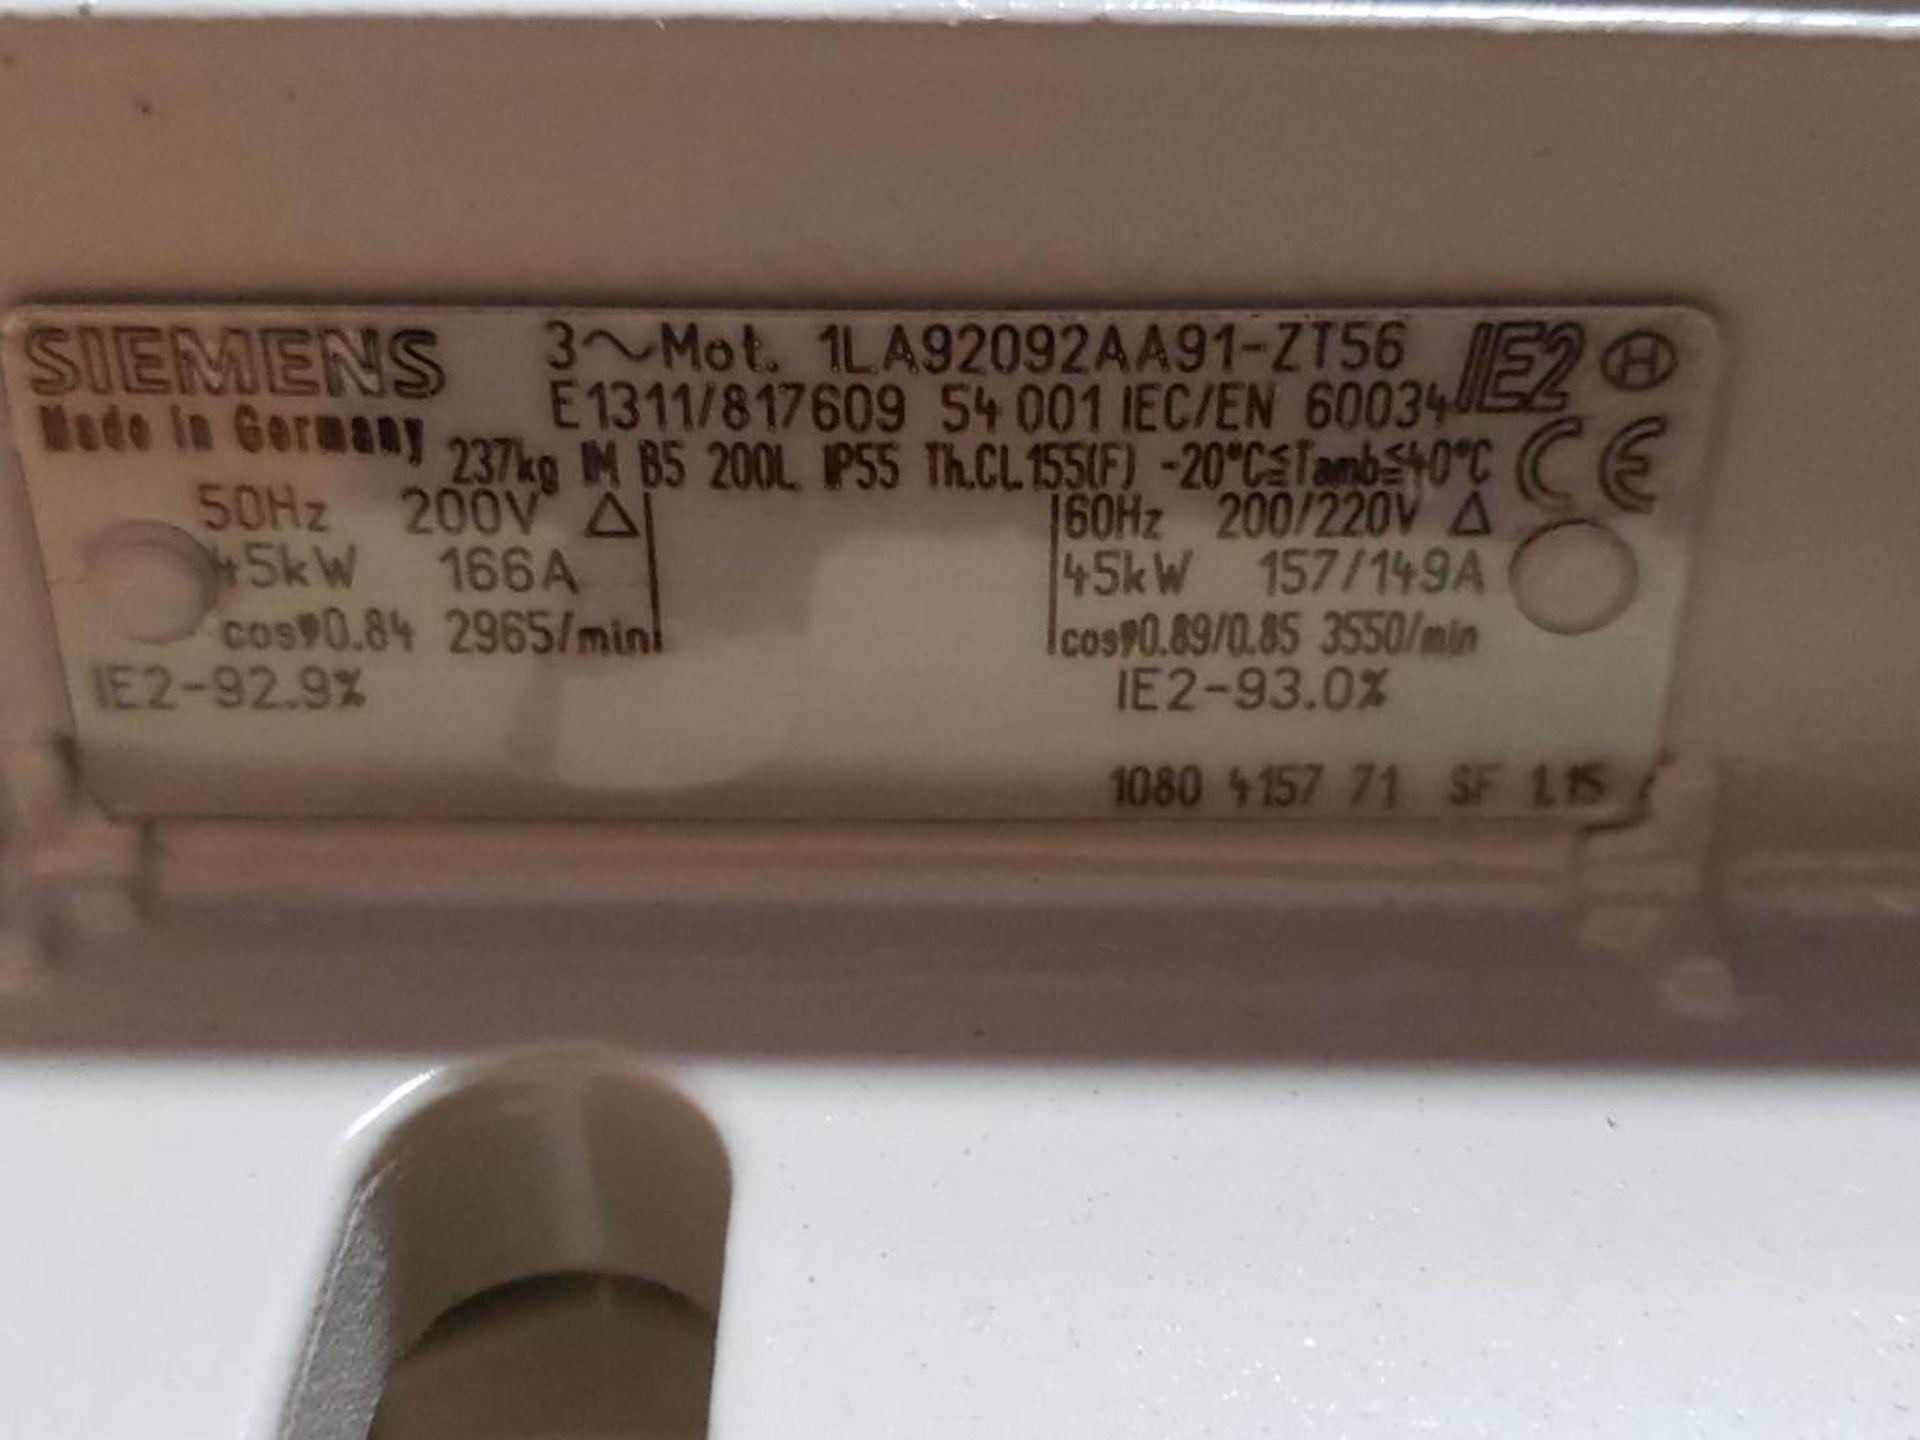 45kW Siemens 3PH motor. 1LA92092AA91-ZT56. 200V, 2965RPM. - Image 5 of 9